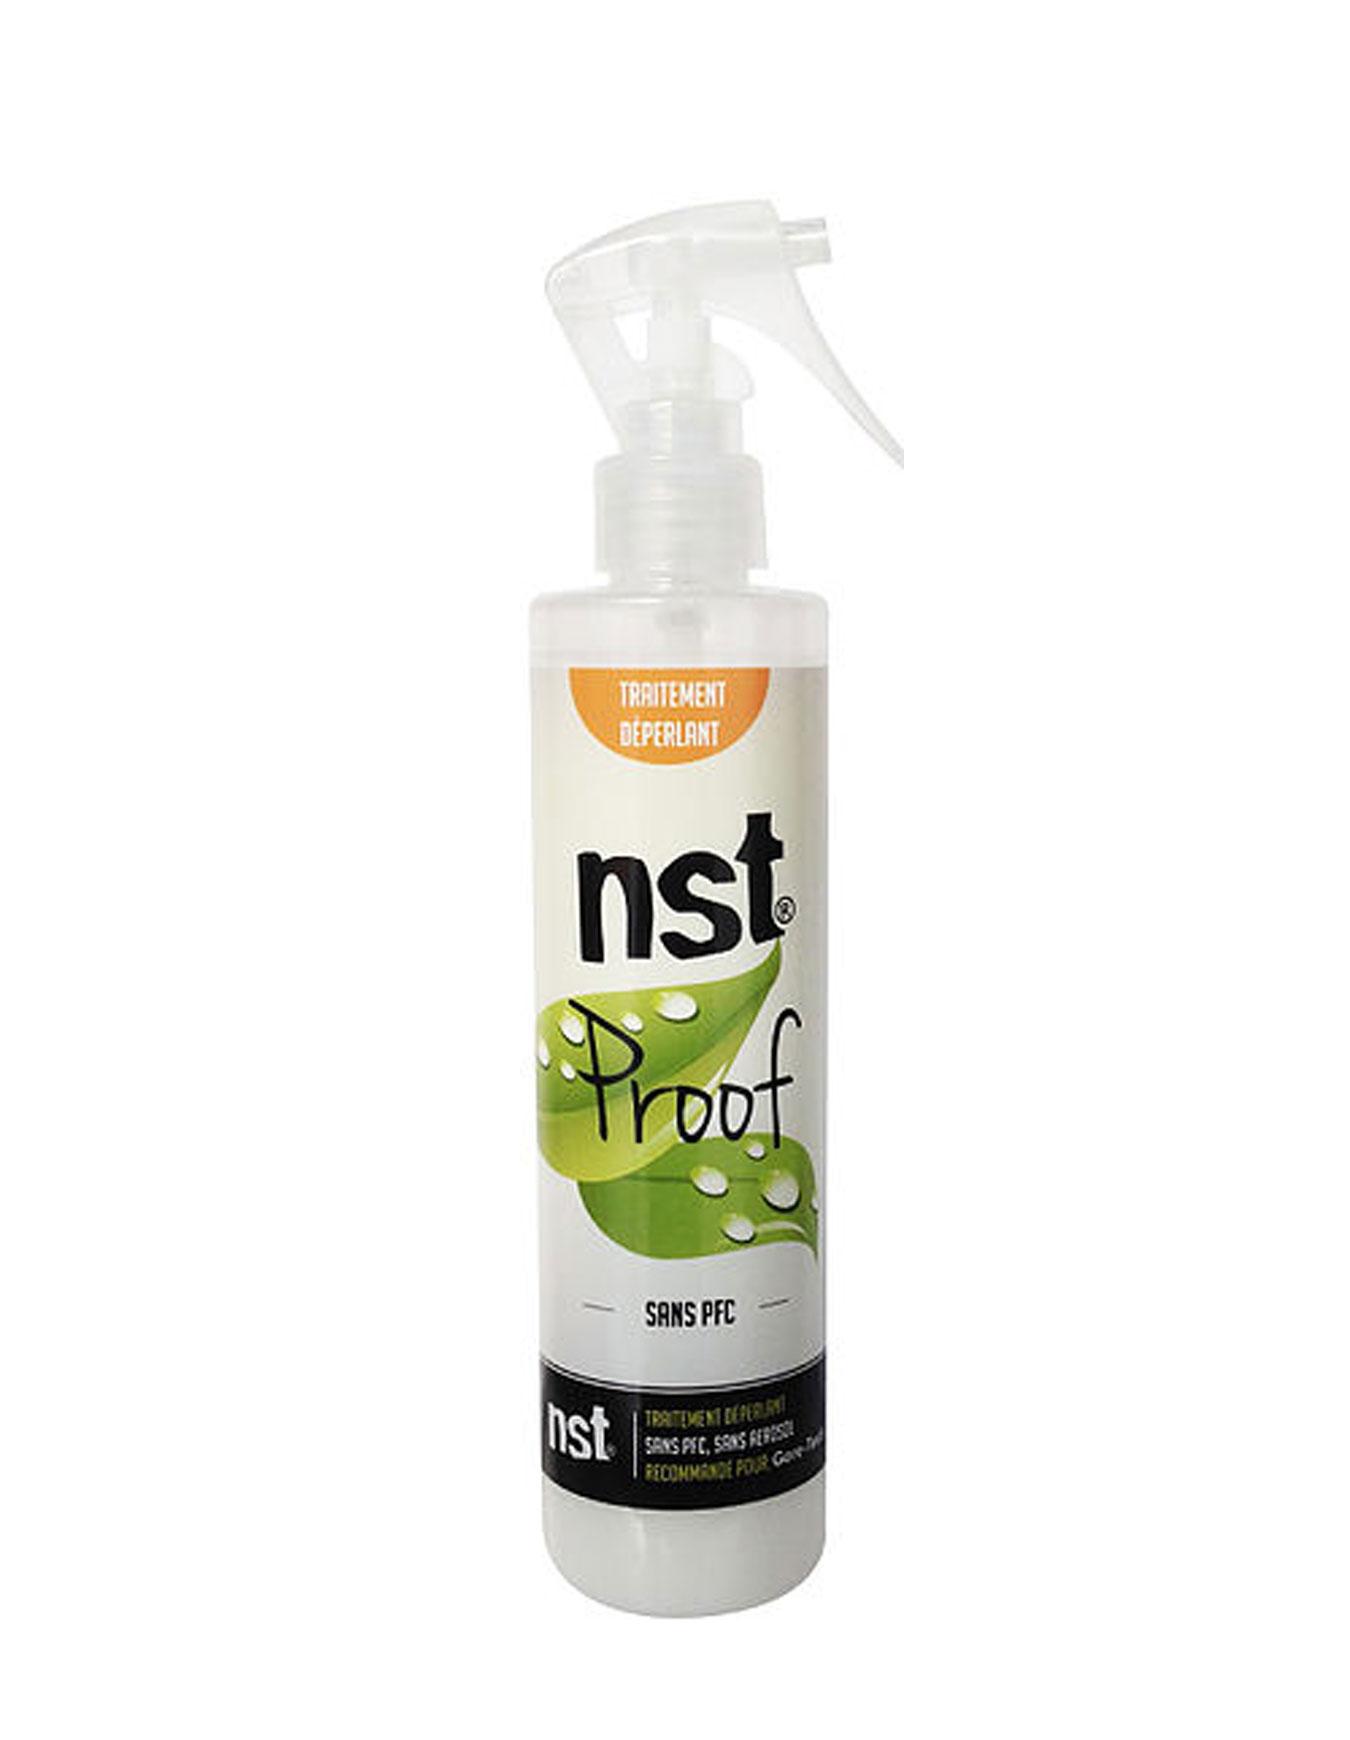 nst_proof_spray_250_ml-simple-nstecoperf-nst_00005_1